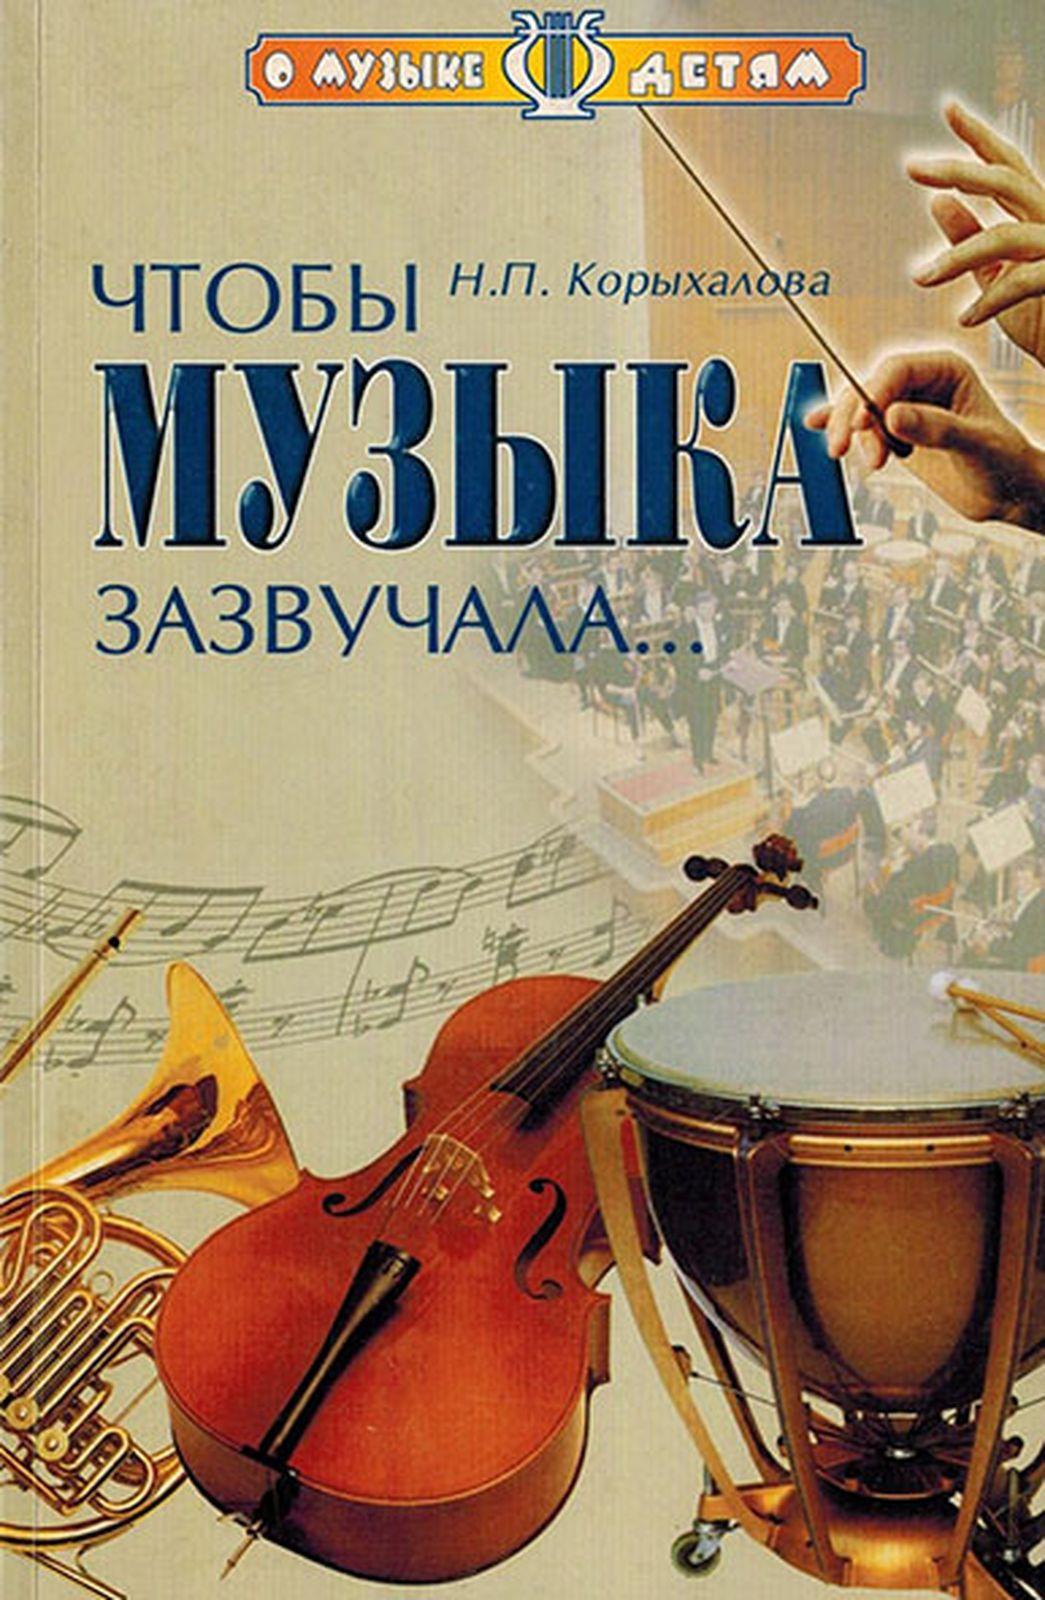 Корыхалова Н.П. Чтобы музыка зазвучала...